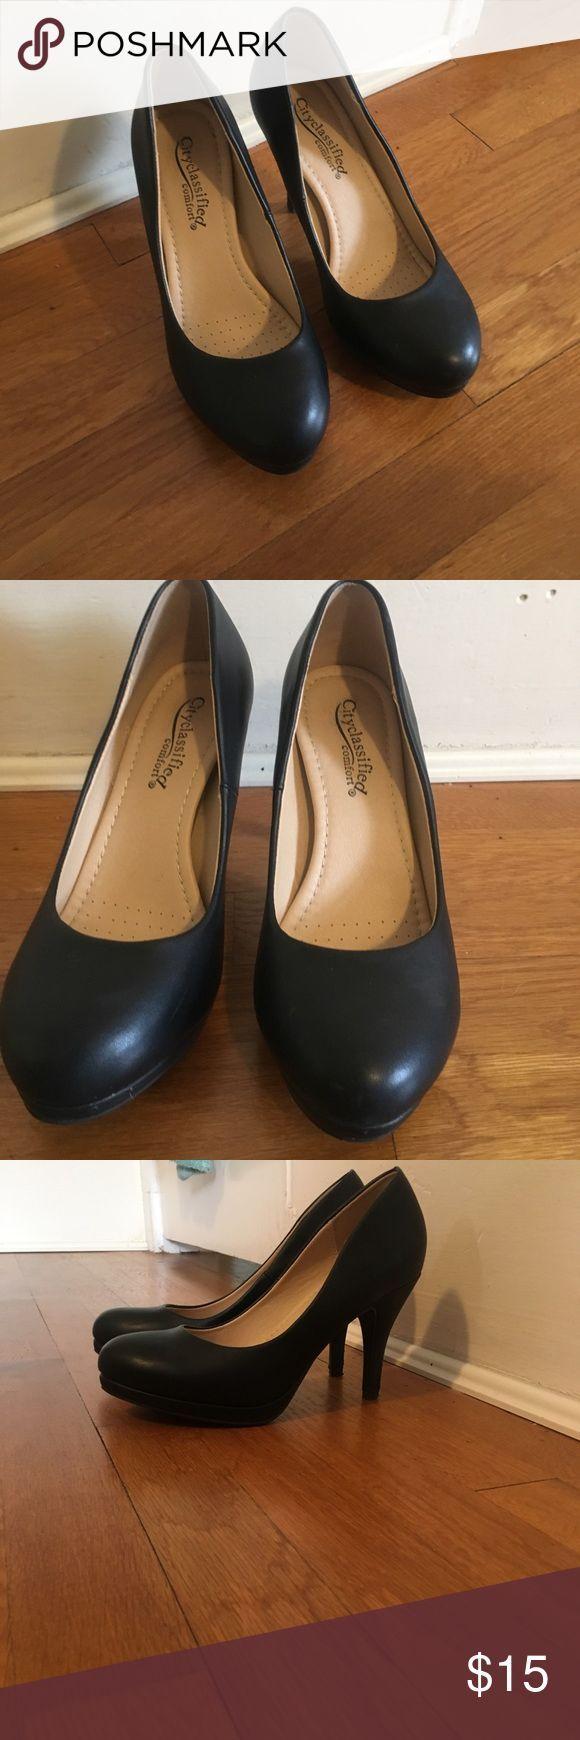 CityClassified comfort black pumps Great black heels for work or formal events! …